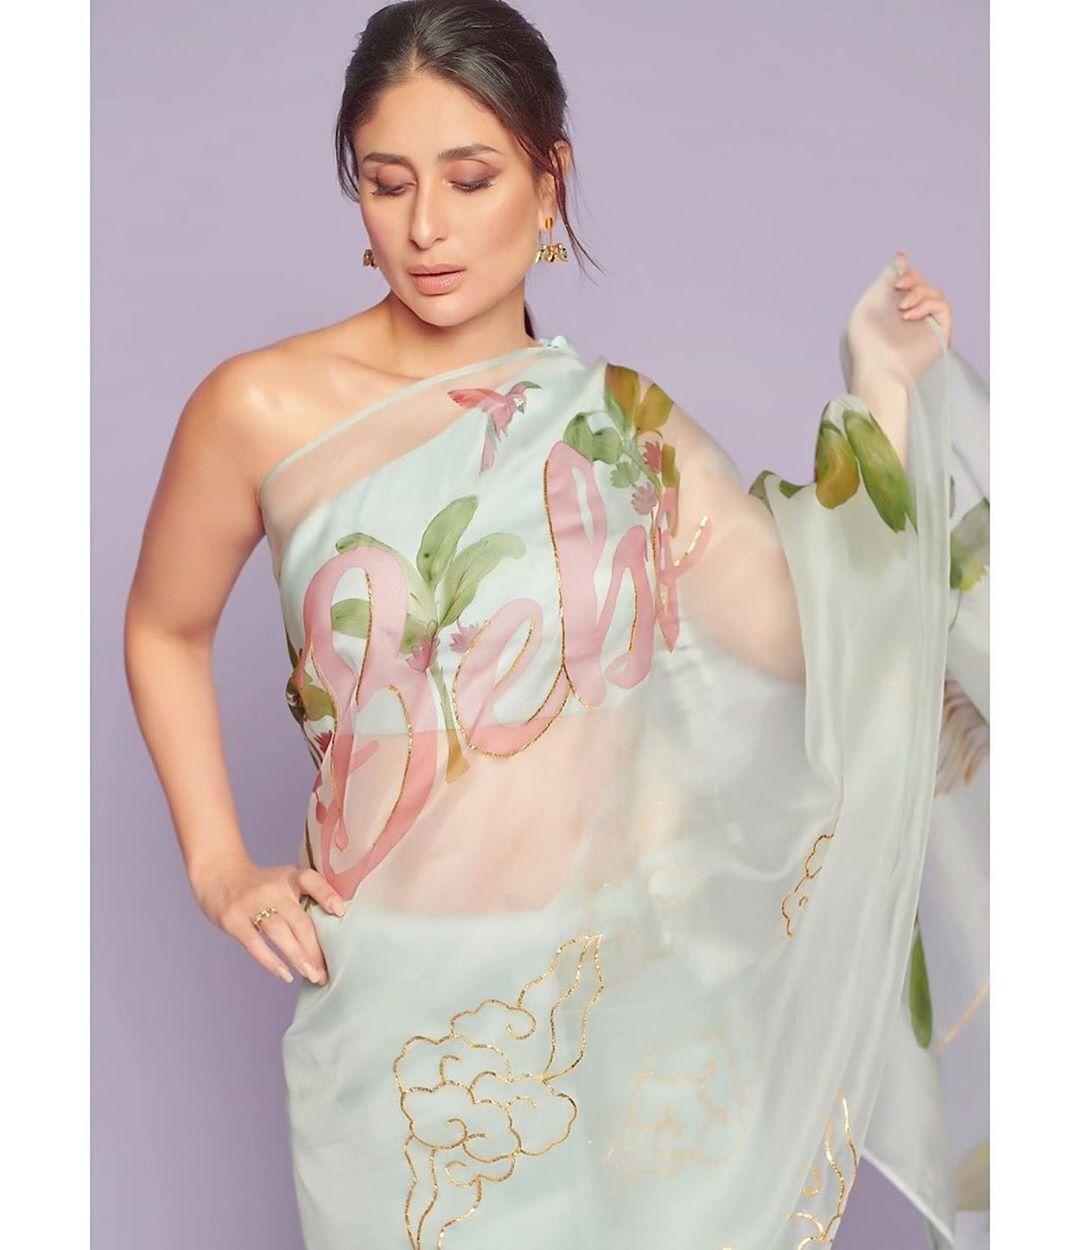 Kareena Kapoor Khan Proves That She Is Her Favourite With Her Bebo Print Saree Moviekoop Bollywood Designer Sarees Kareena Kapoor Fashion Attire